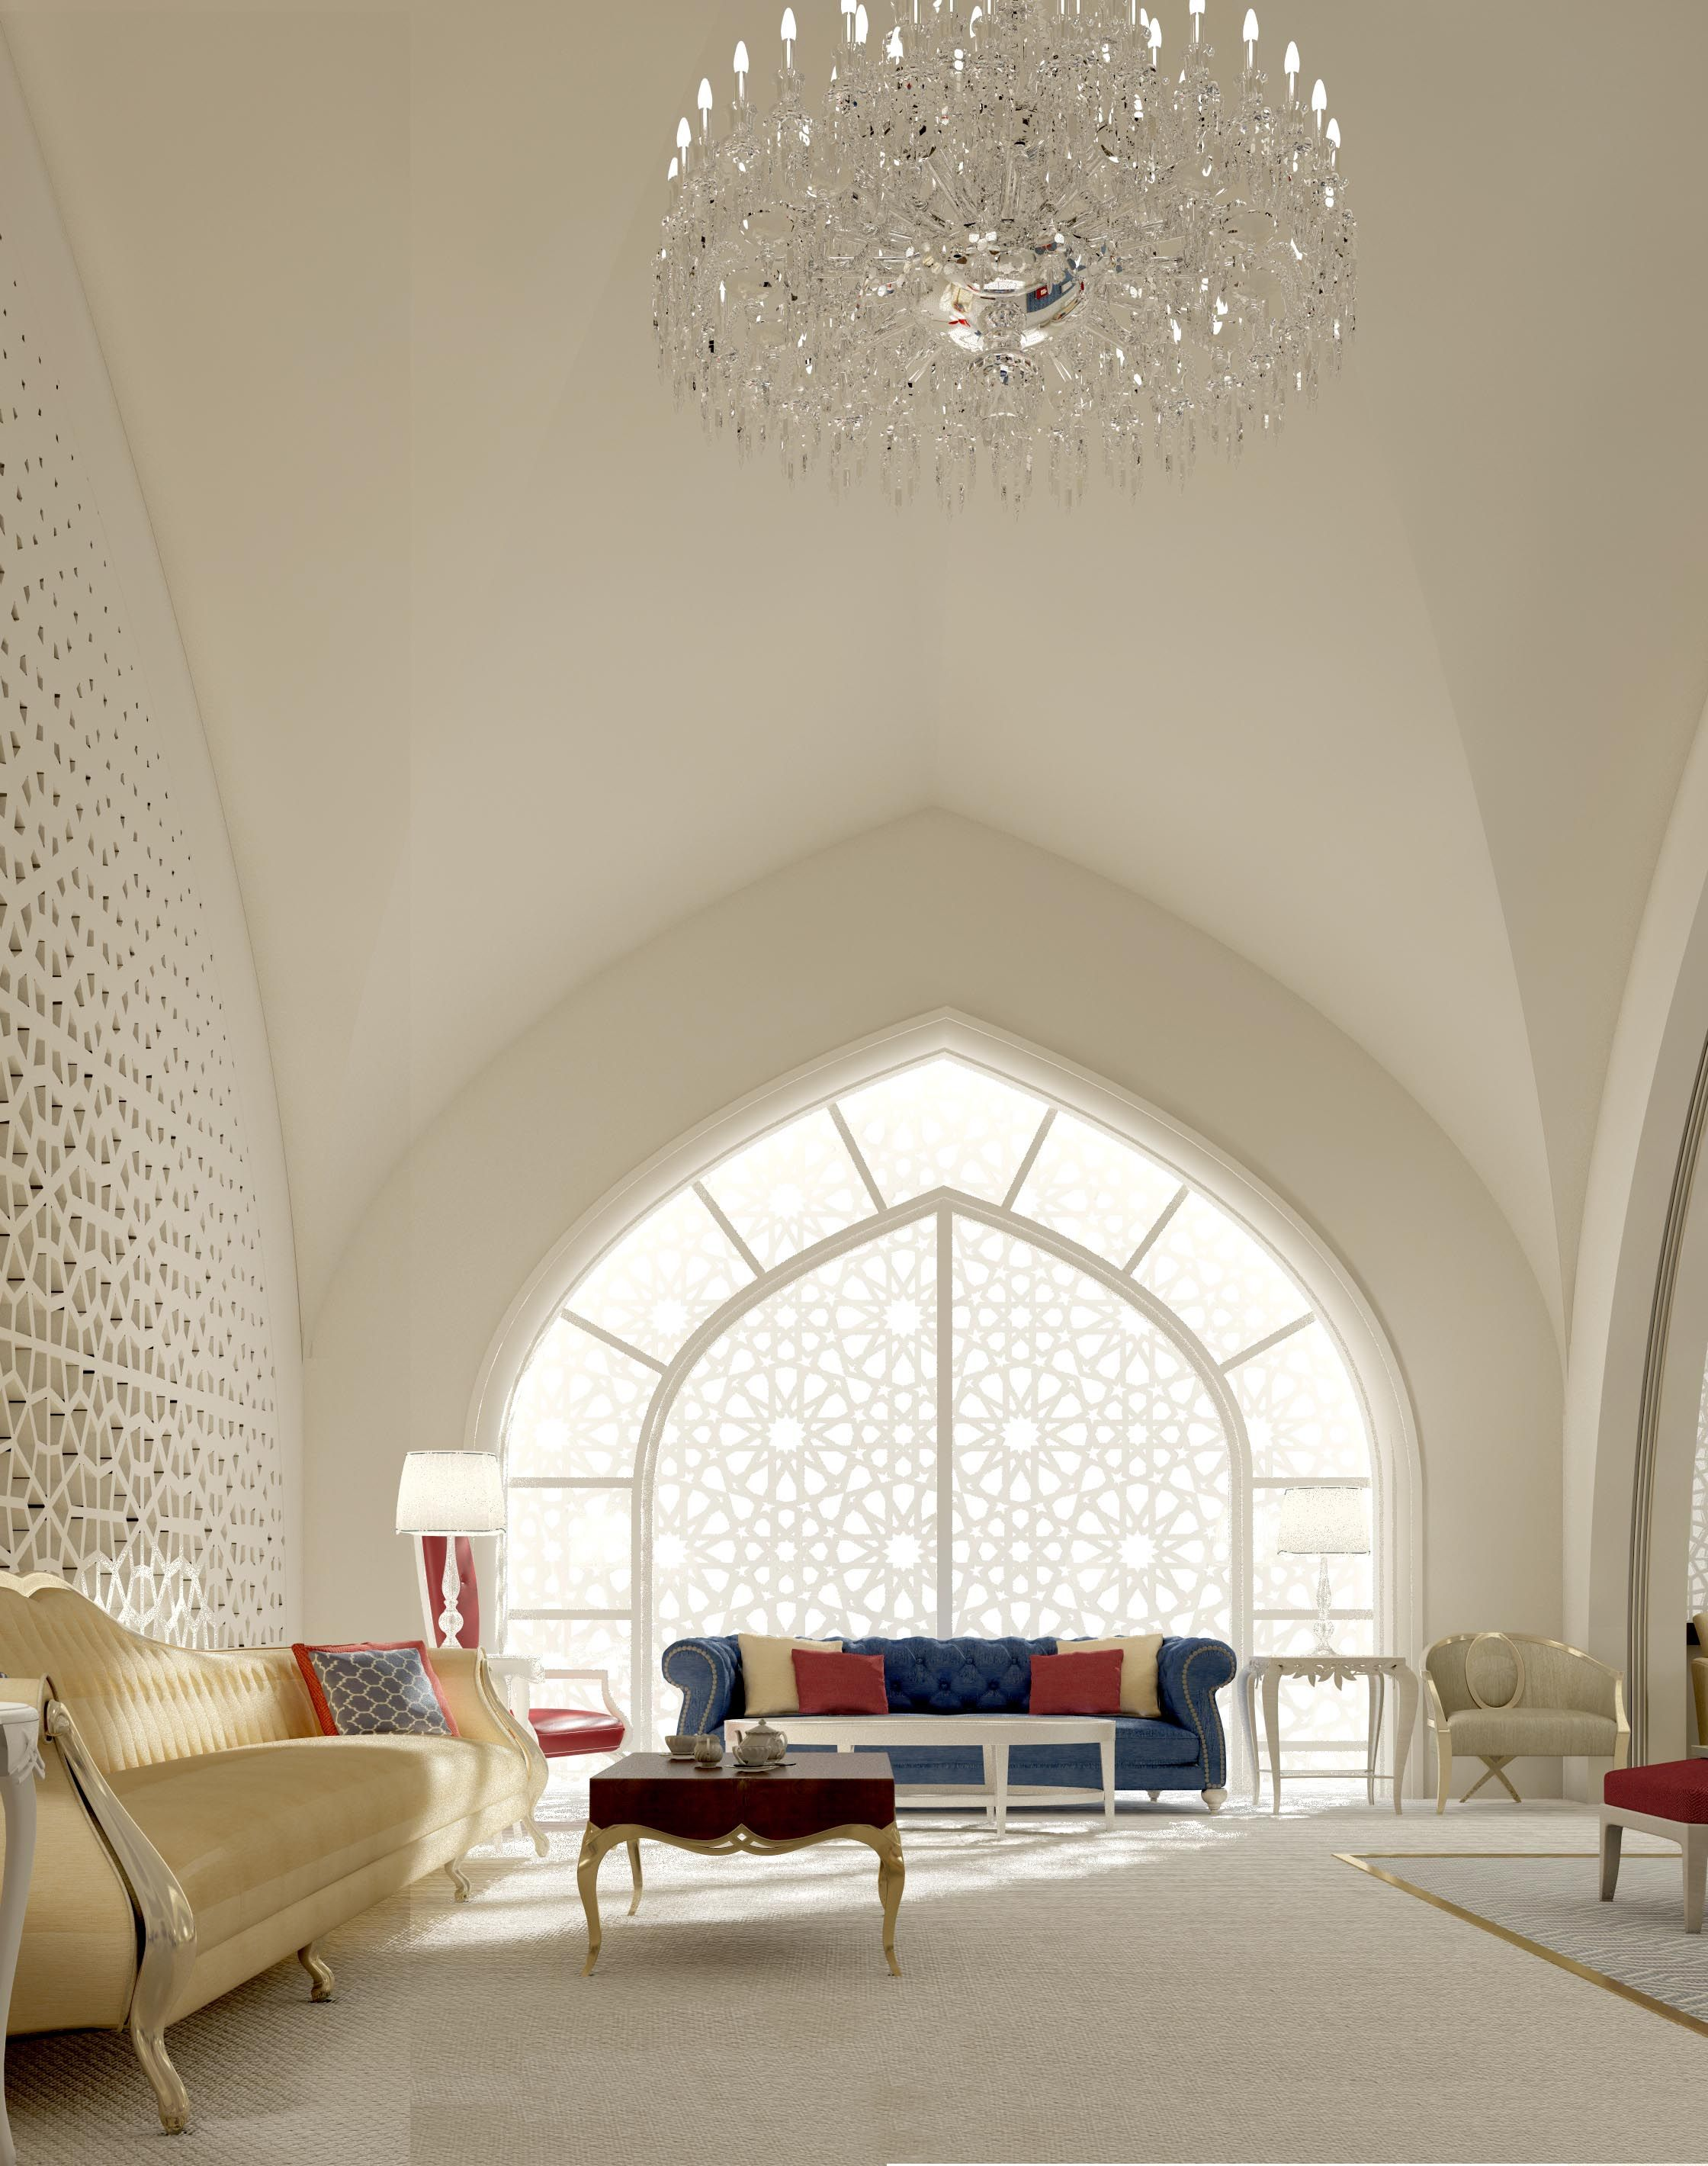 Mimar Interiors | Interior | Pinterest | Interiors, Moroccan and ...